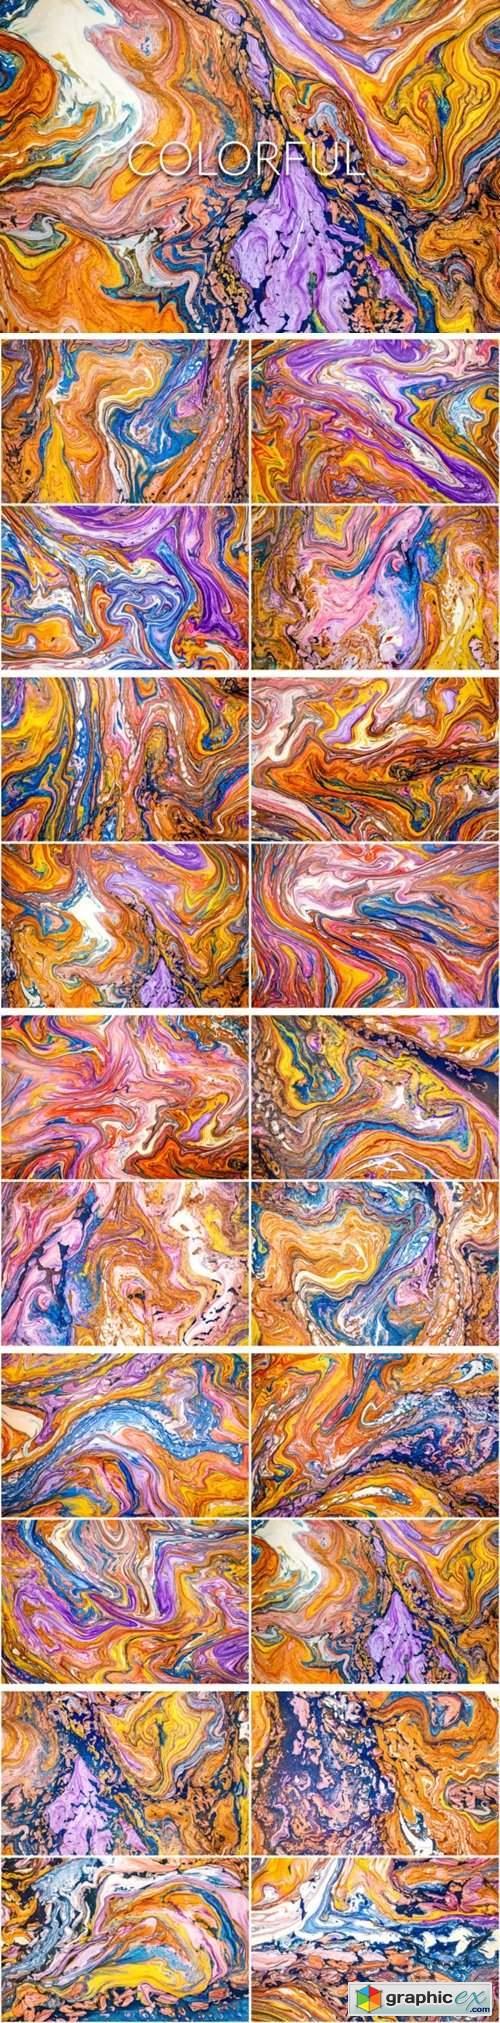 Handmade Liquid Paint - Colorful